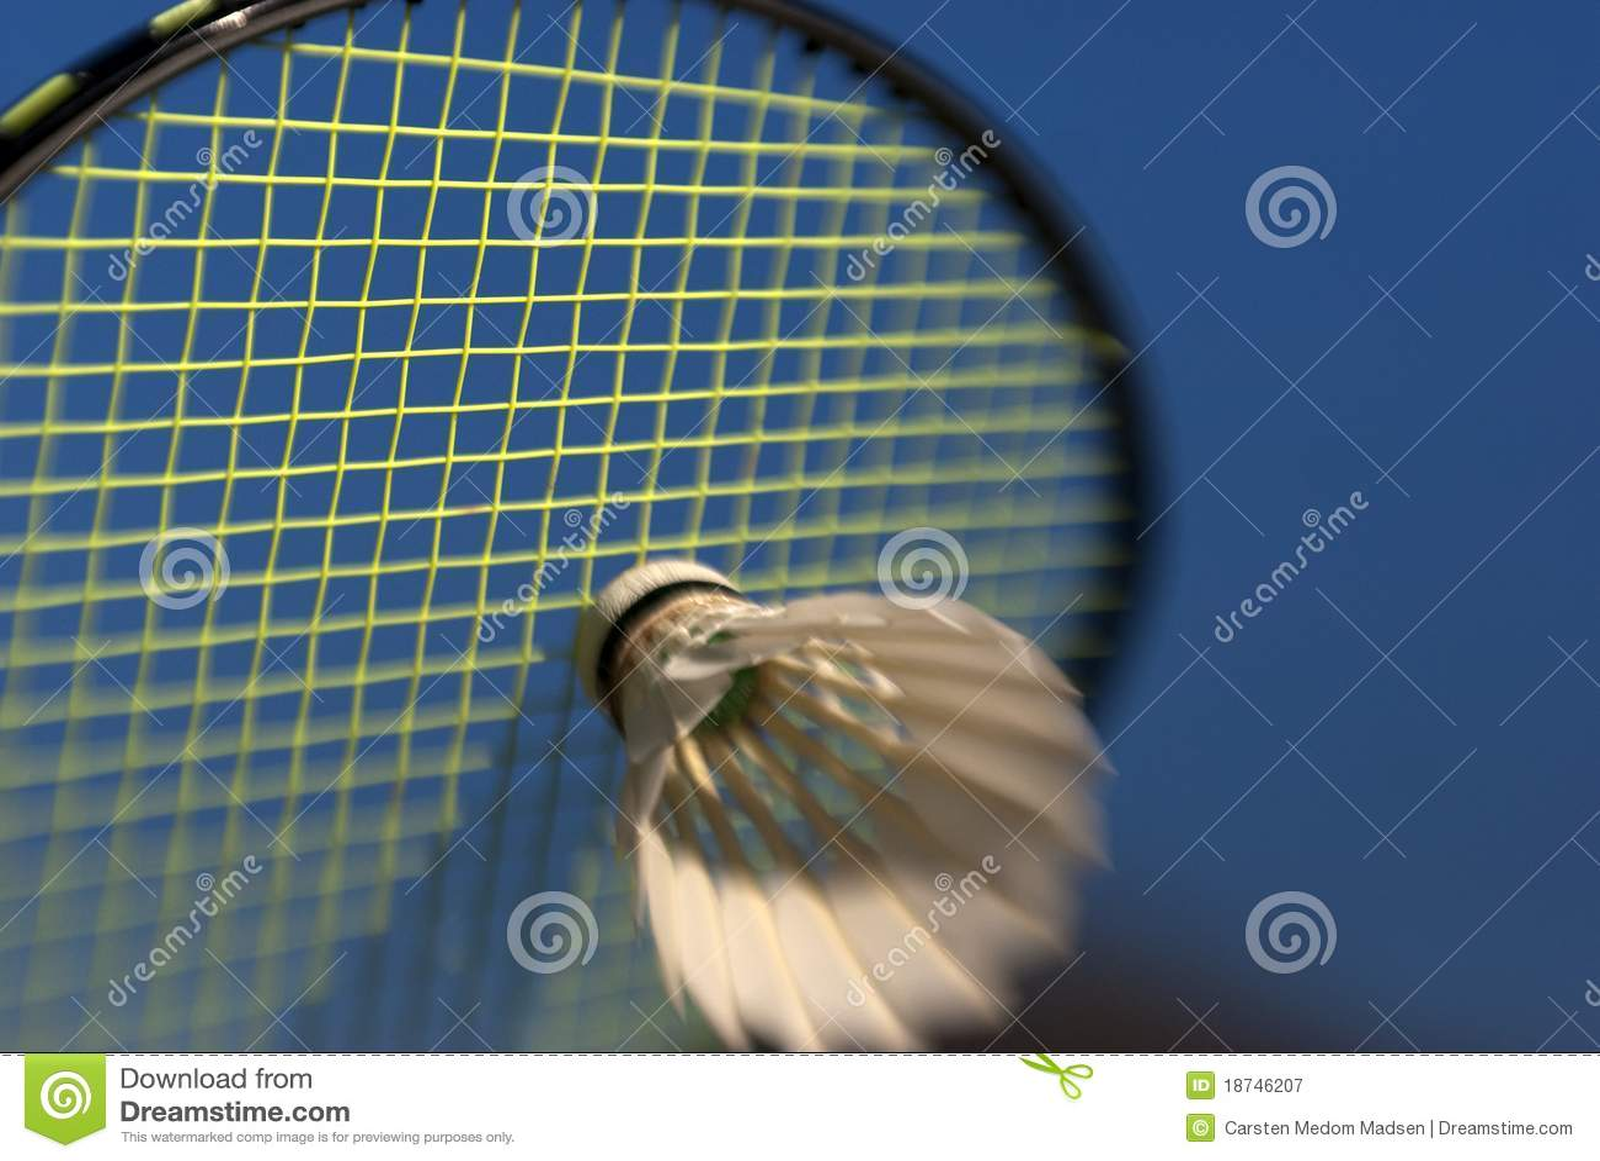 Badminton abstract